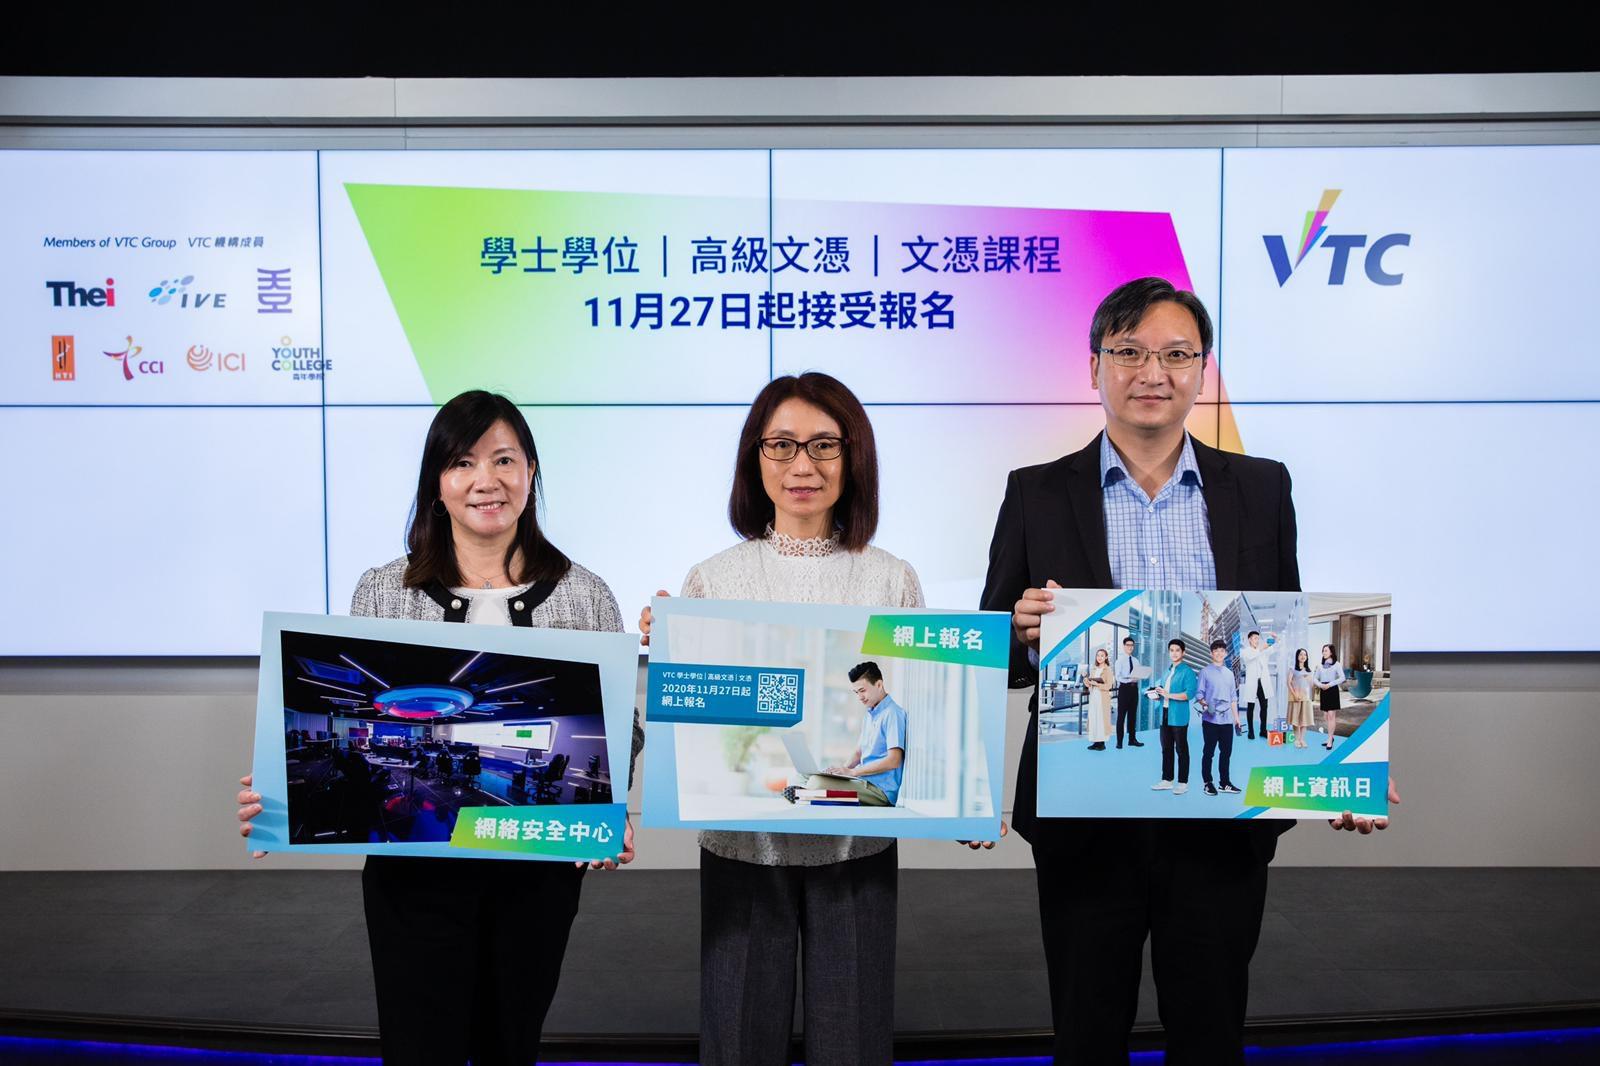 DSE 2021|VTC課程周五起網上報名 中六生人數跌來年學額減數百|香港01|社會新聞